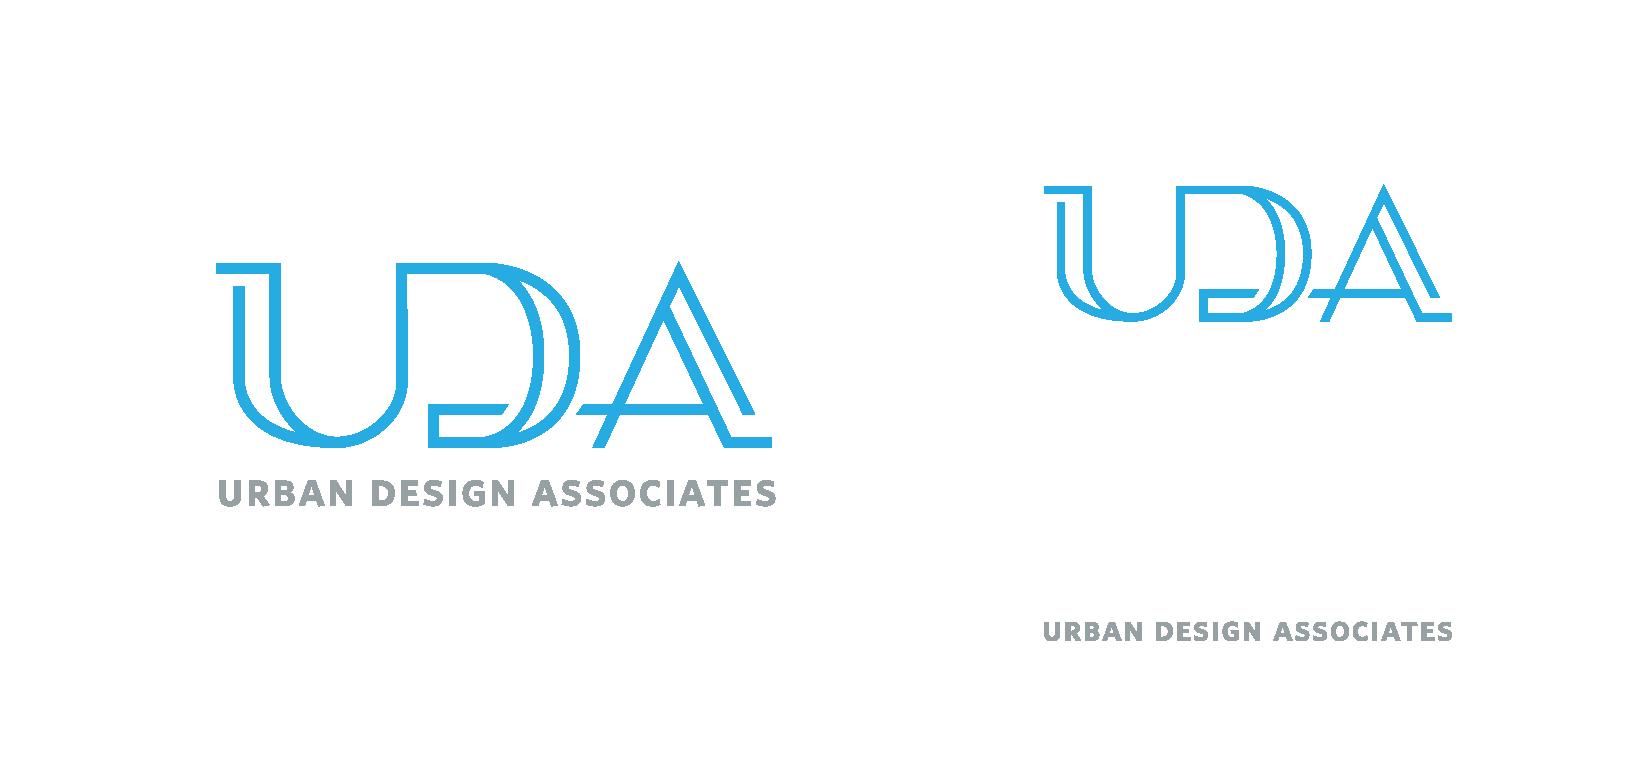 Design-and-Architcture_Branding_Urban-Design-Associates_Bootstrap-Design-Co-02-01.png